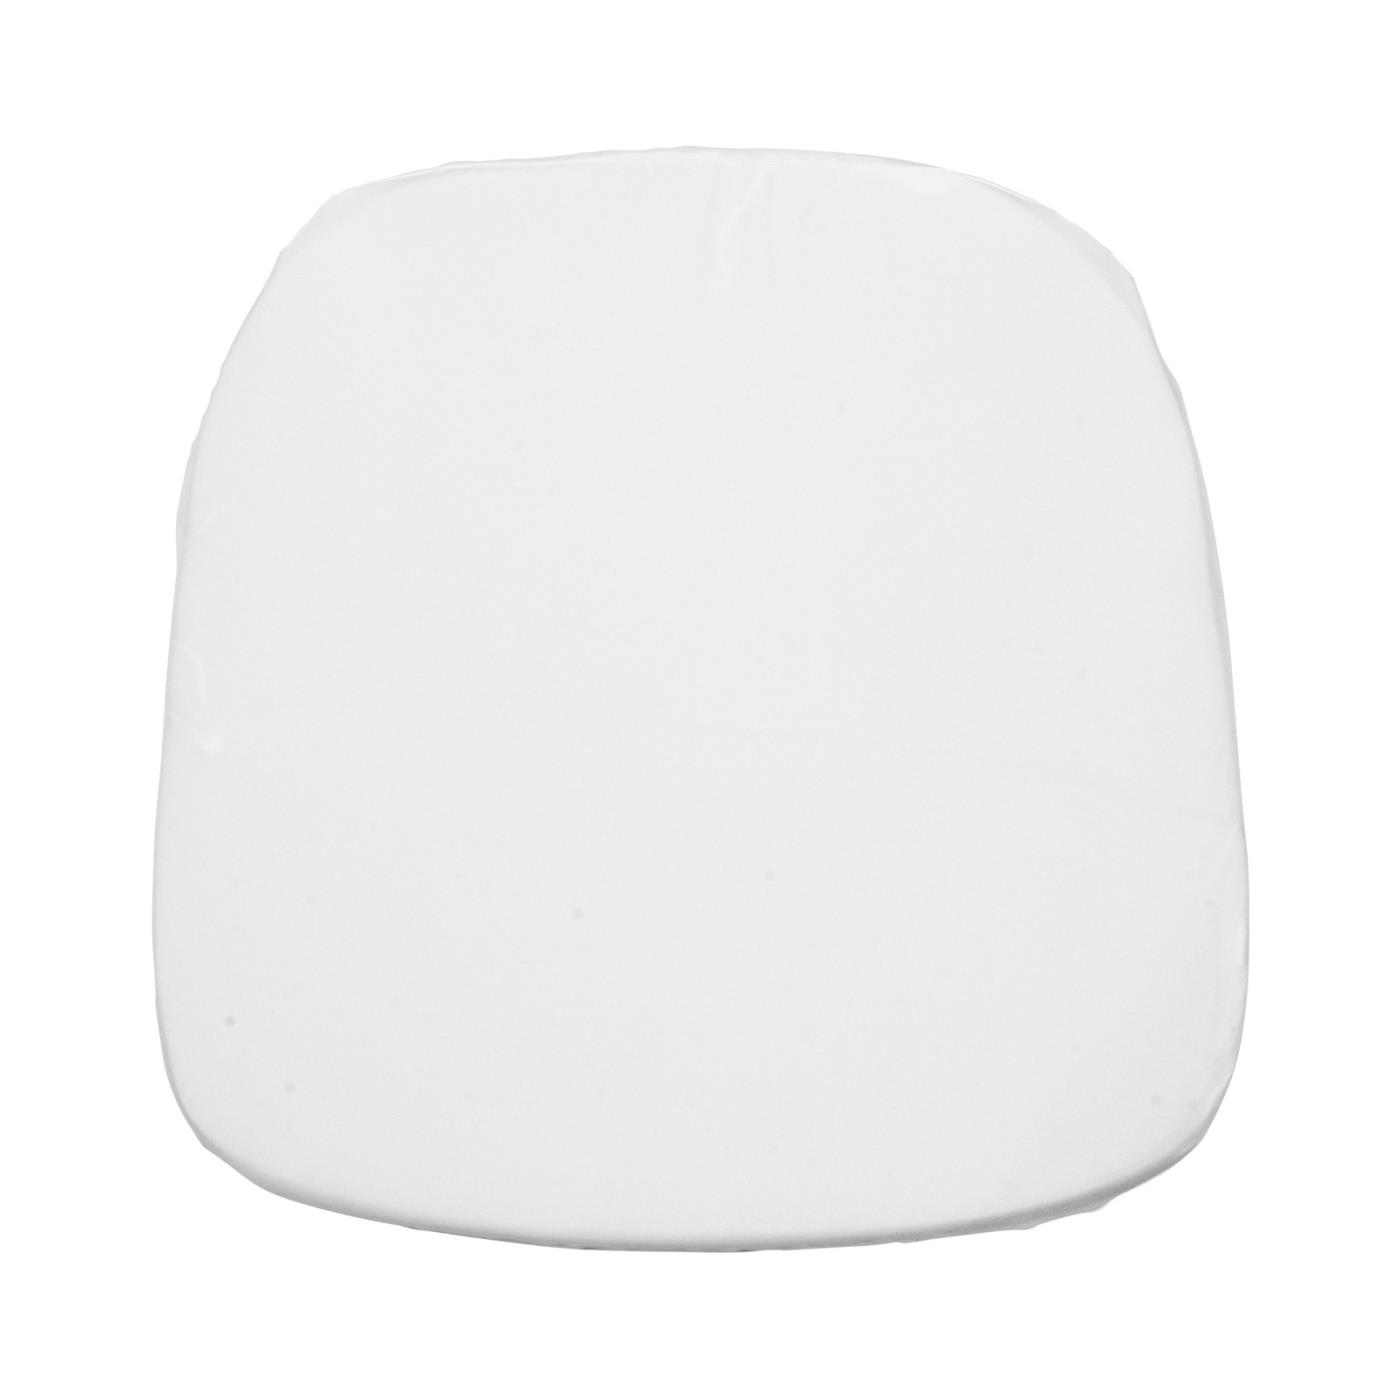 Poly Seat Cushion - White